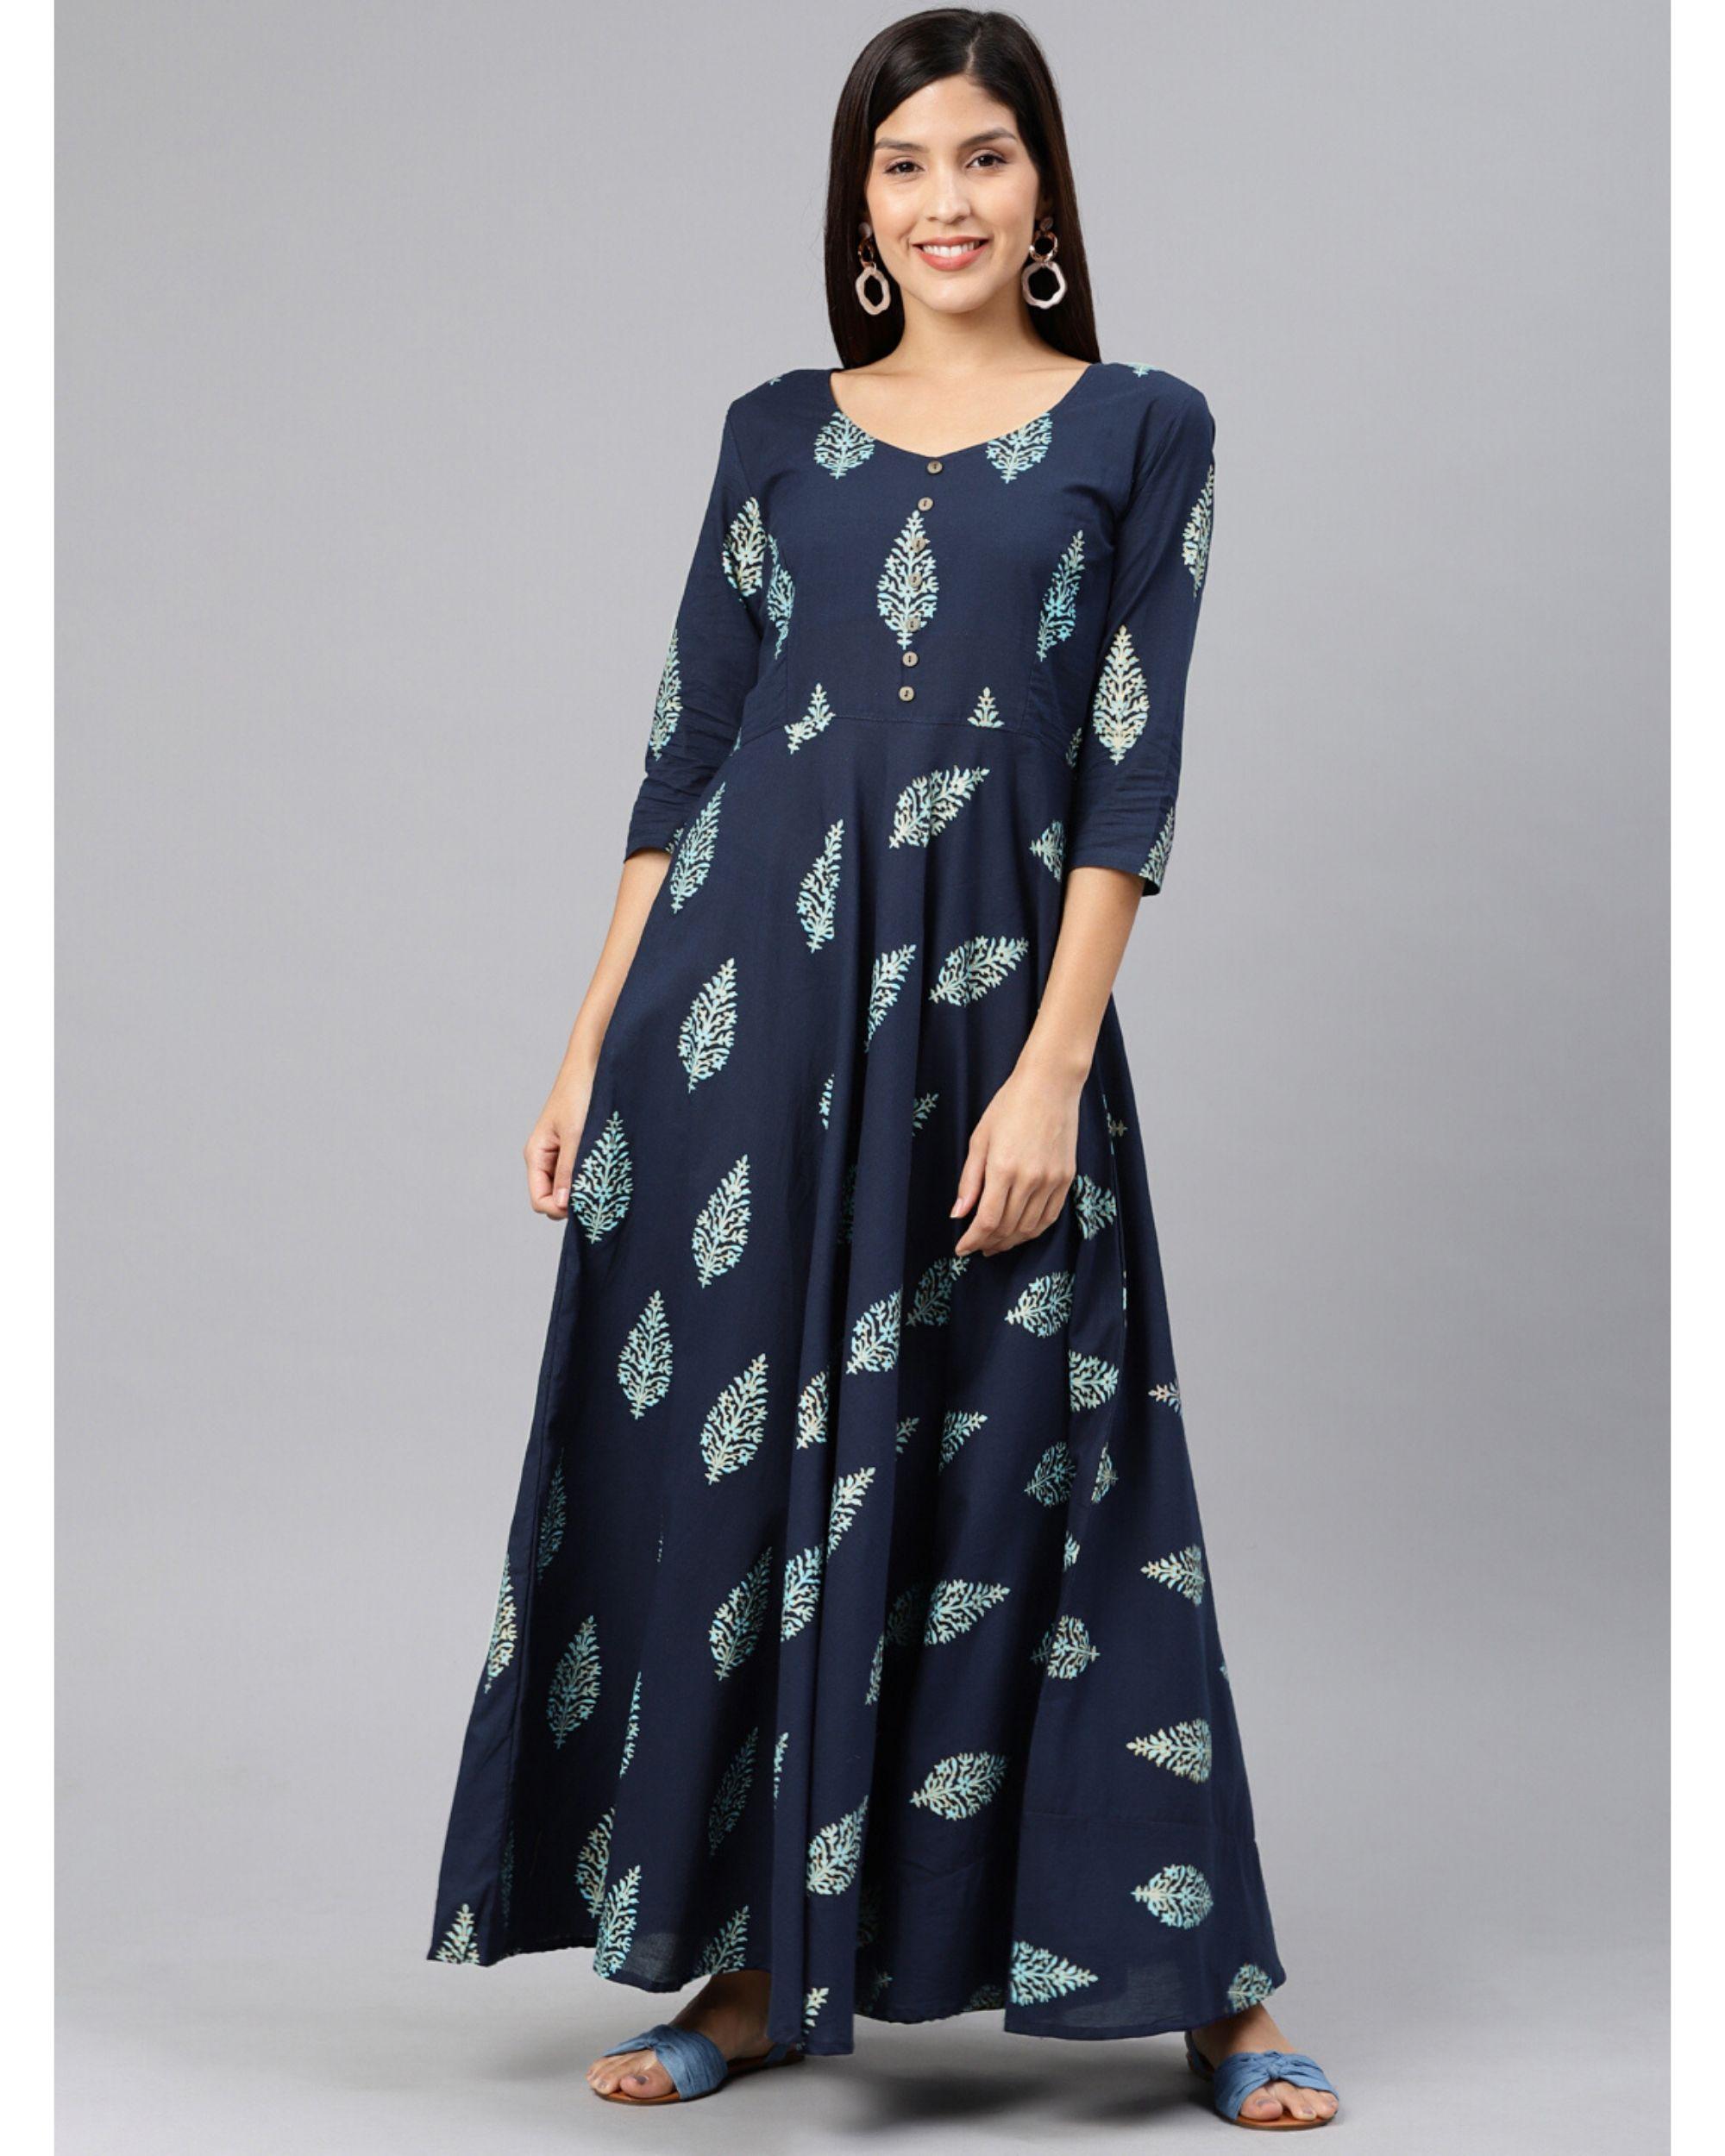 Navy blue leaf printed dress